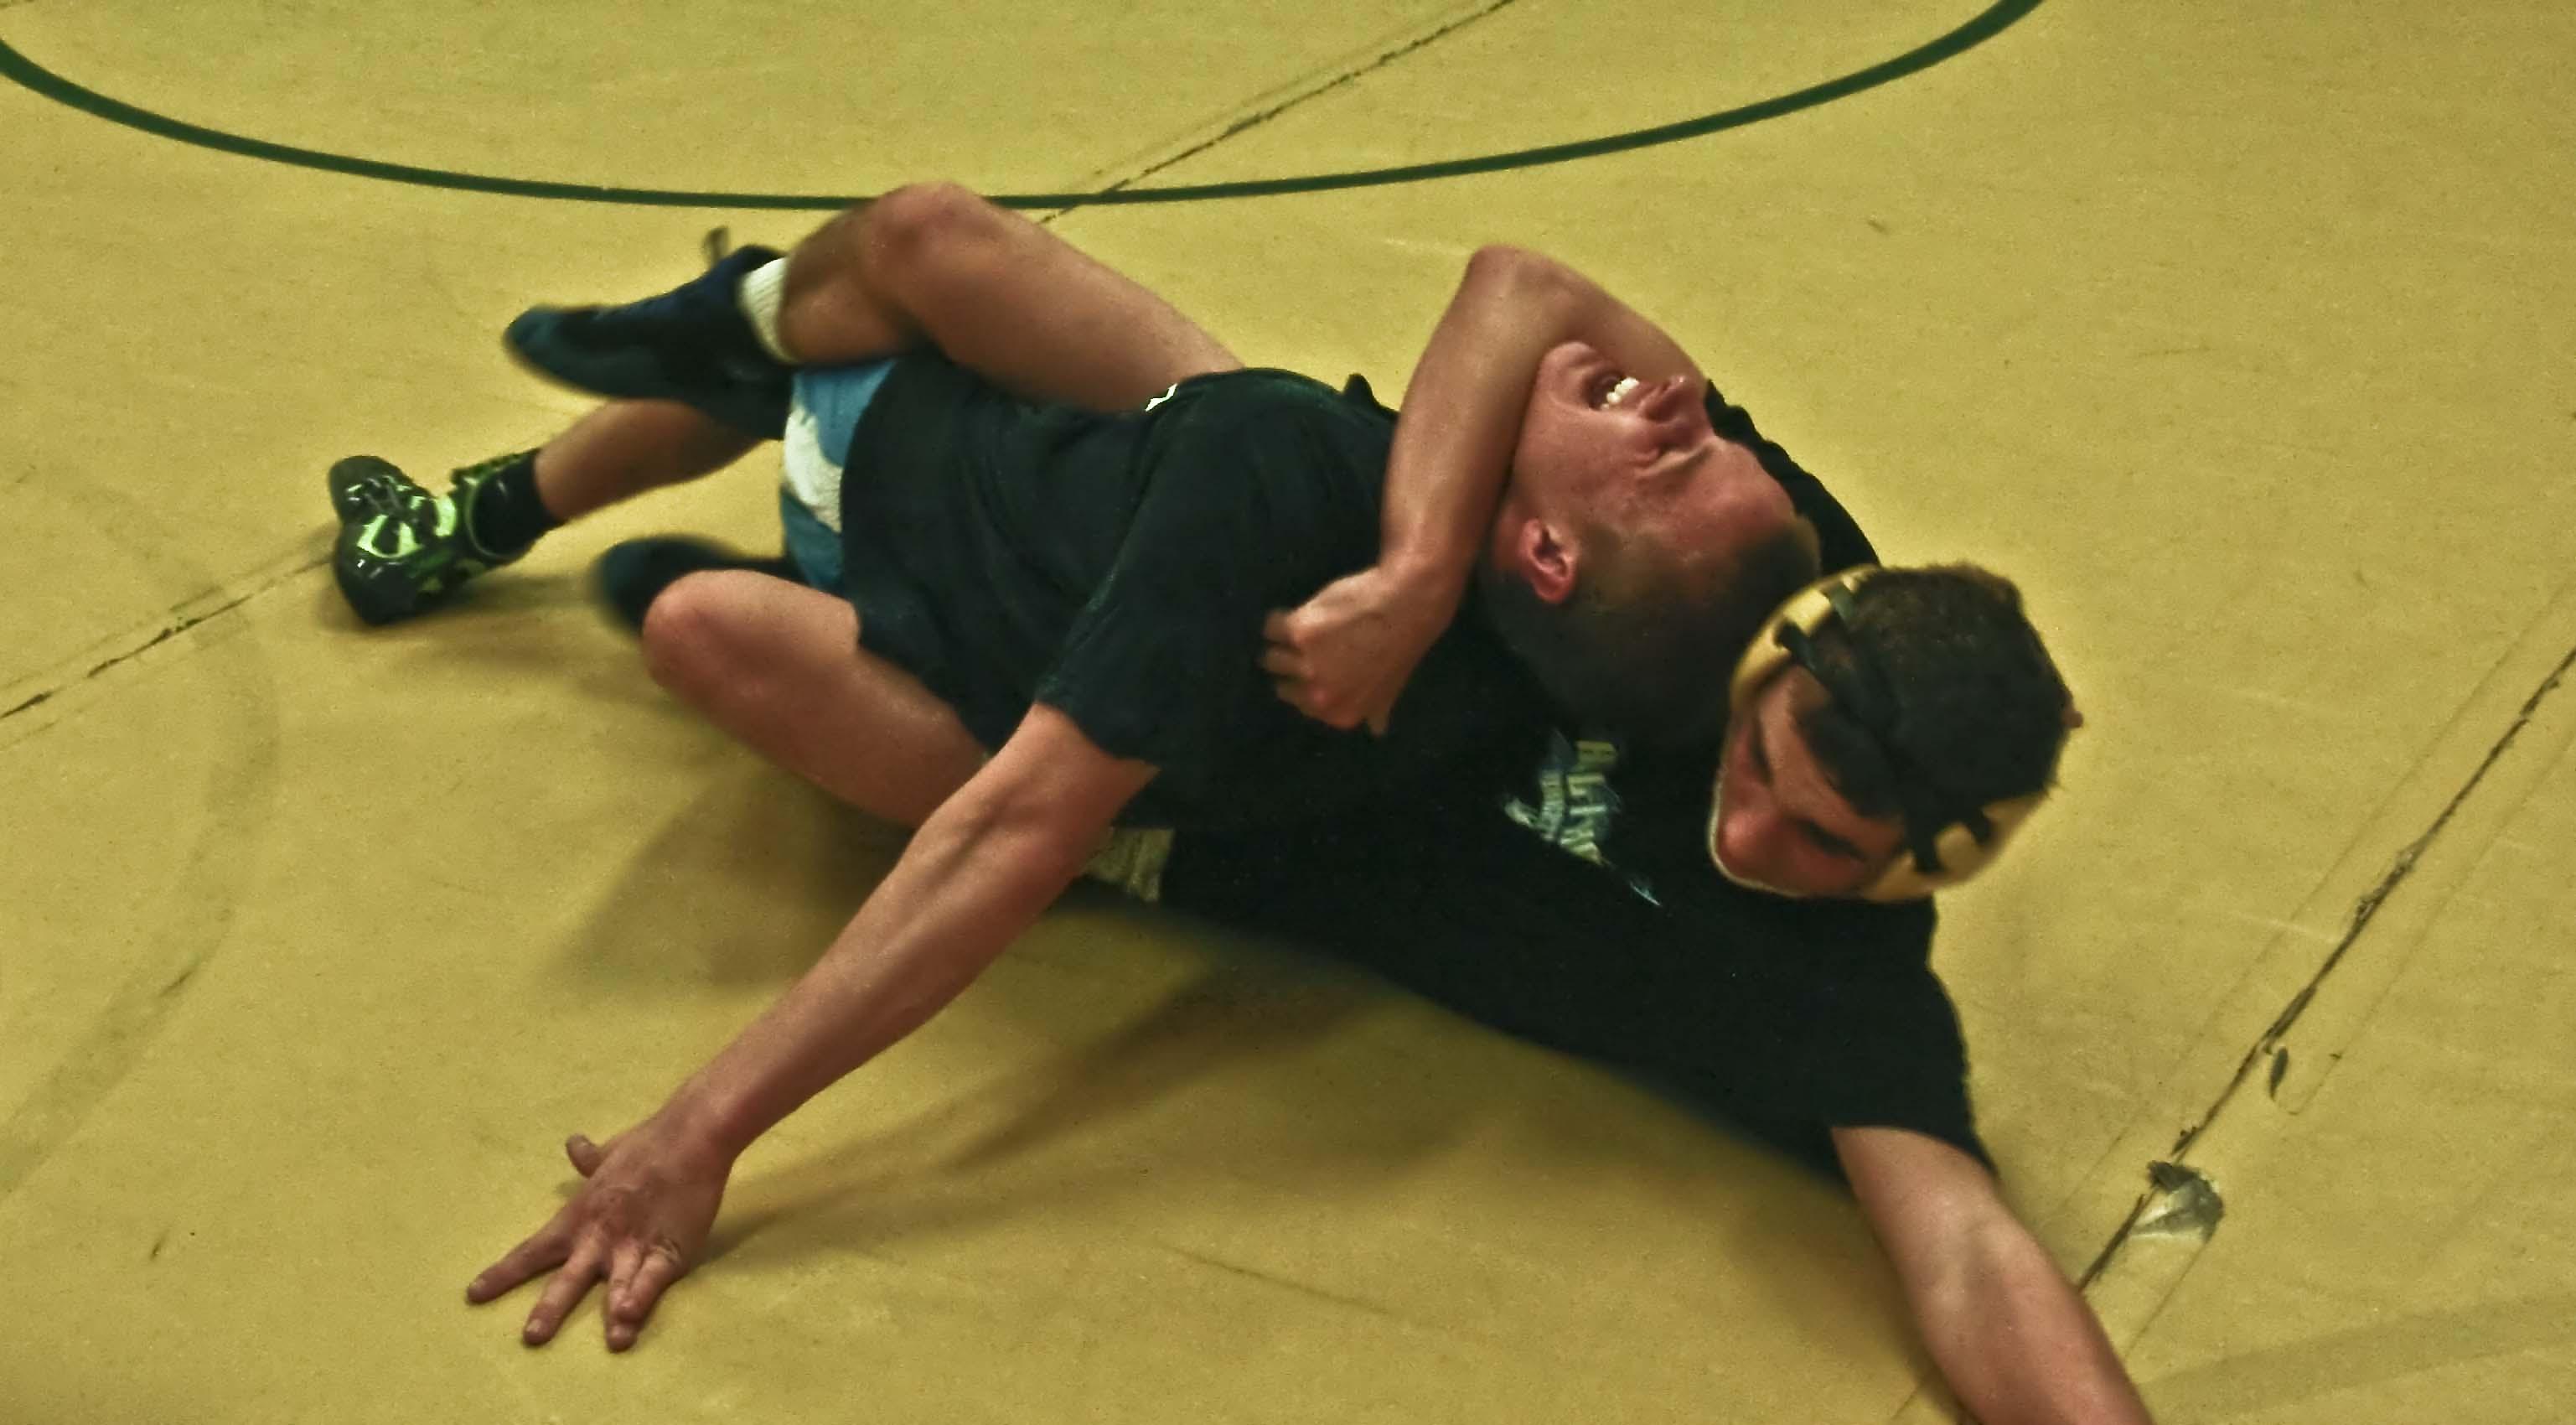 West Linn High wrestling team plans striking changes for upcoming year